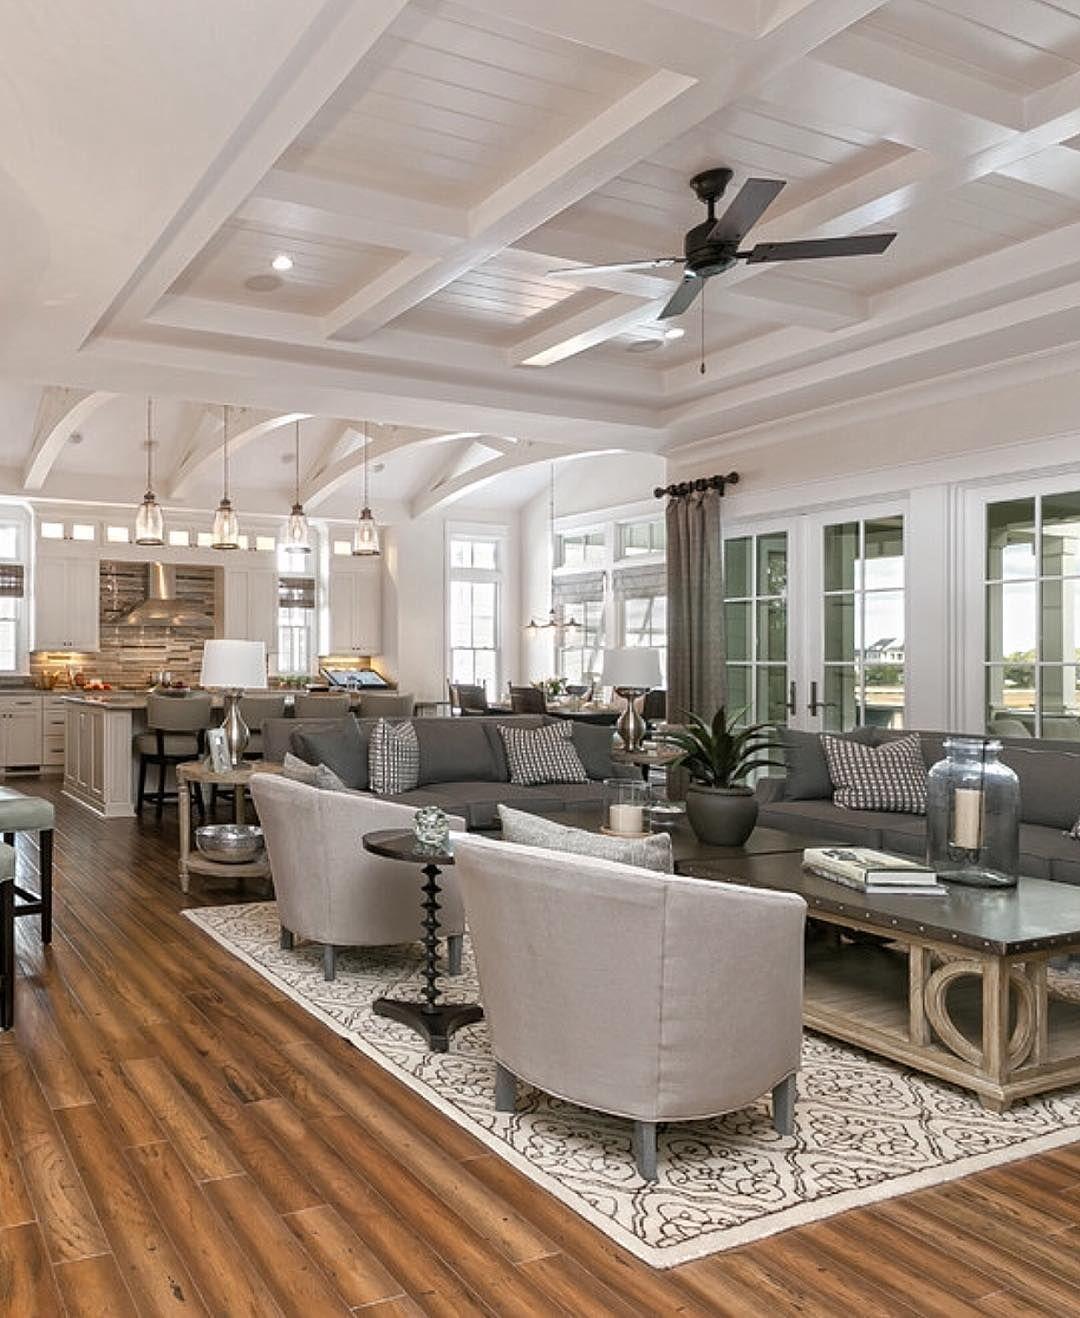 Arthur Rutenberg Homes Custom Home Design Living Area: Floor To Ceiling Perfection By Arthur Rutenberg